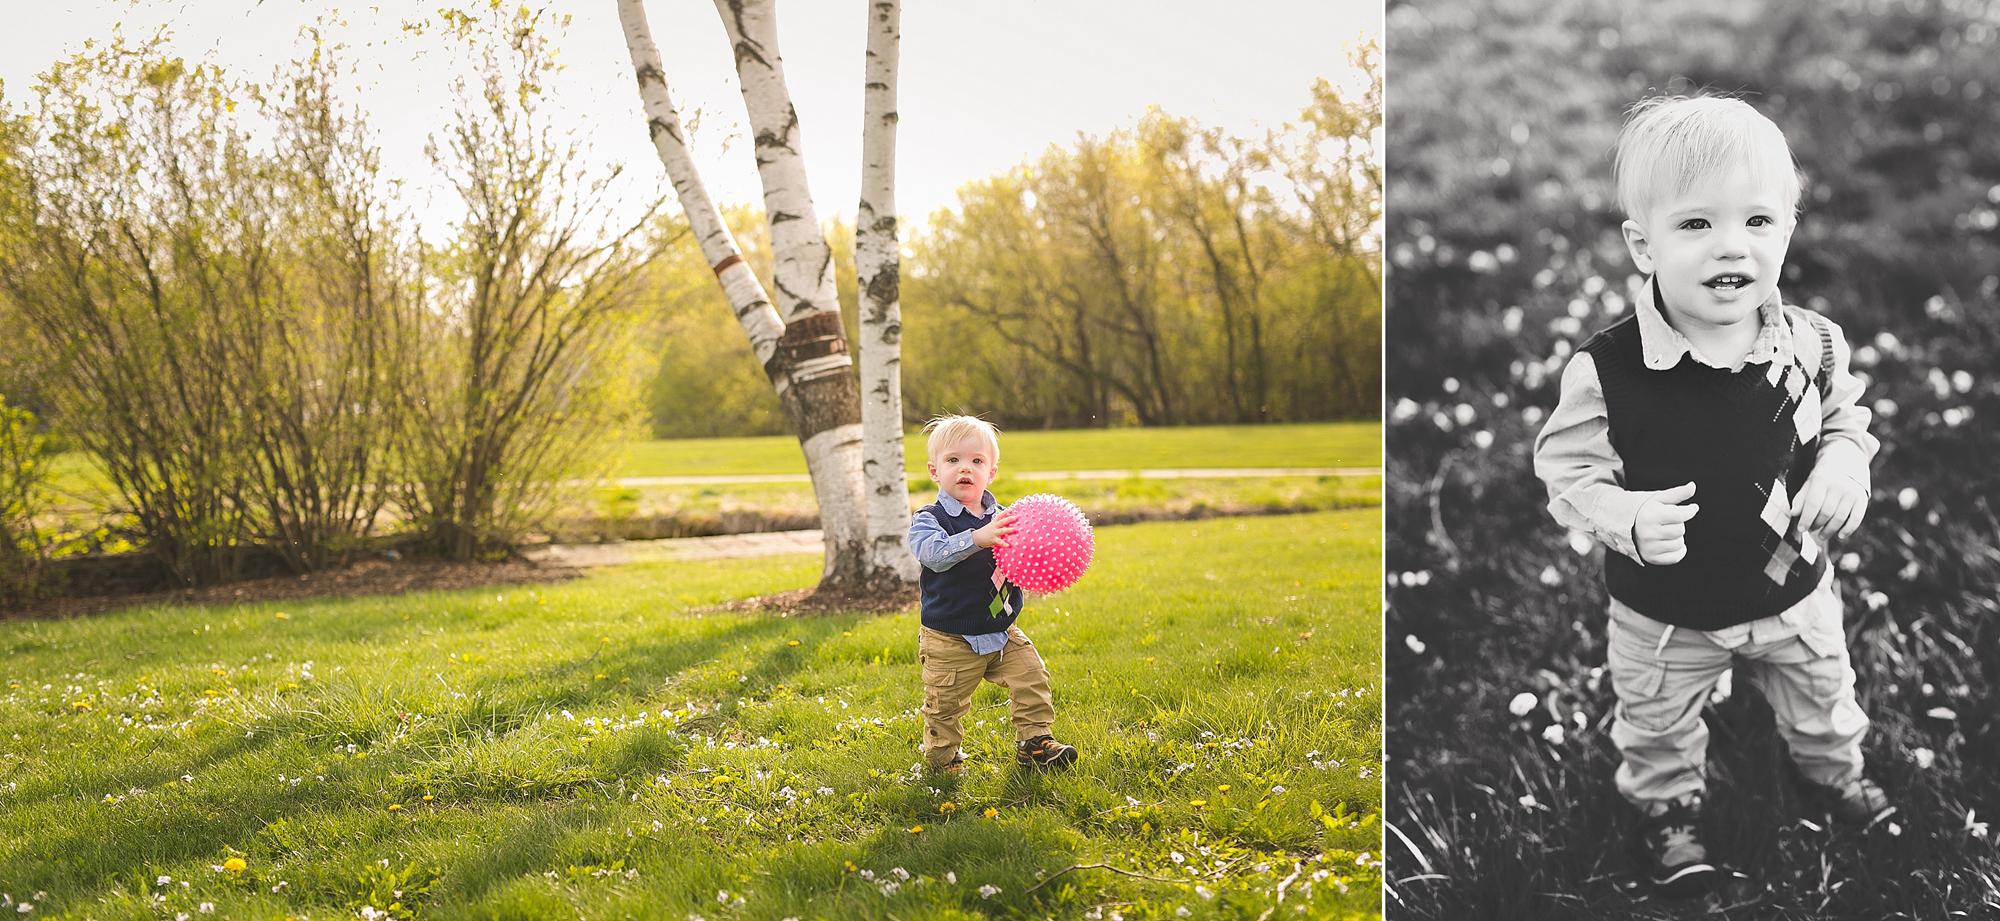 ashley vos photography seattle area lifestyle family photographer_0438.jpg